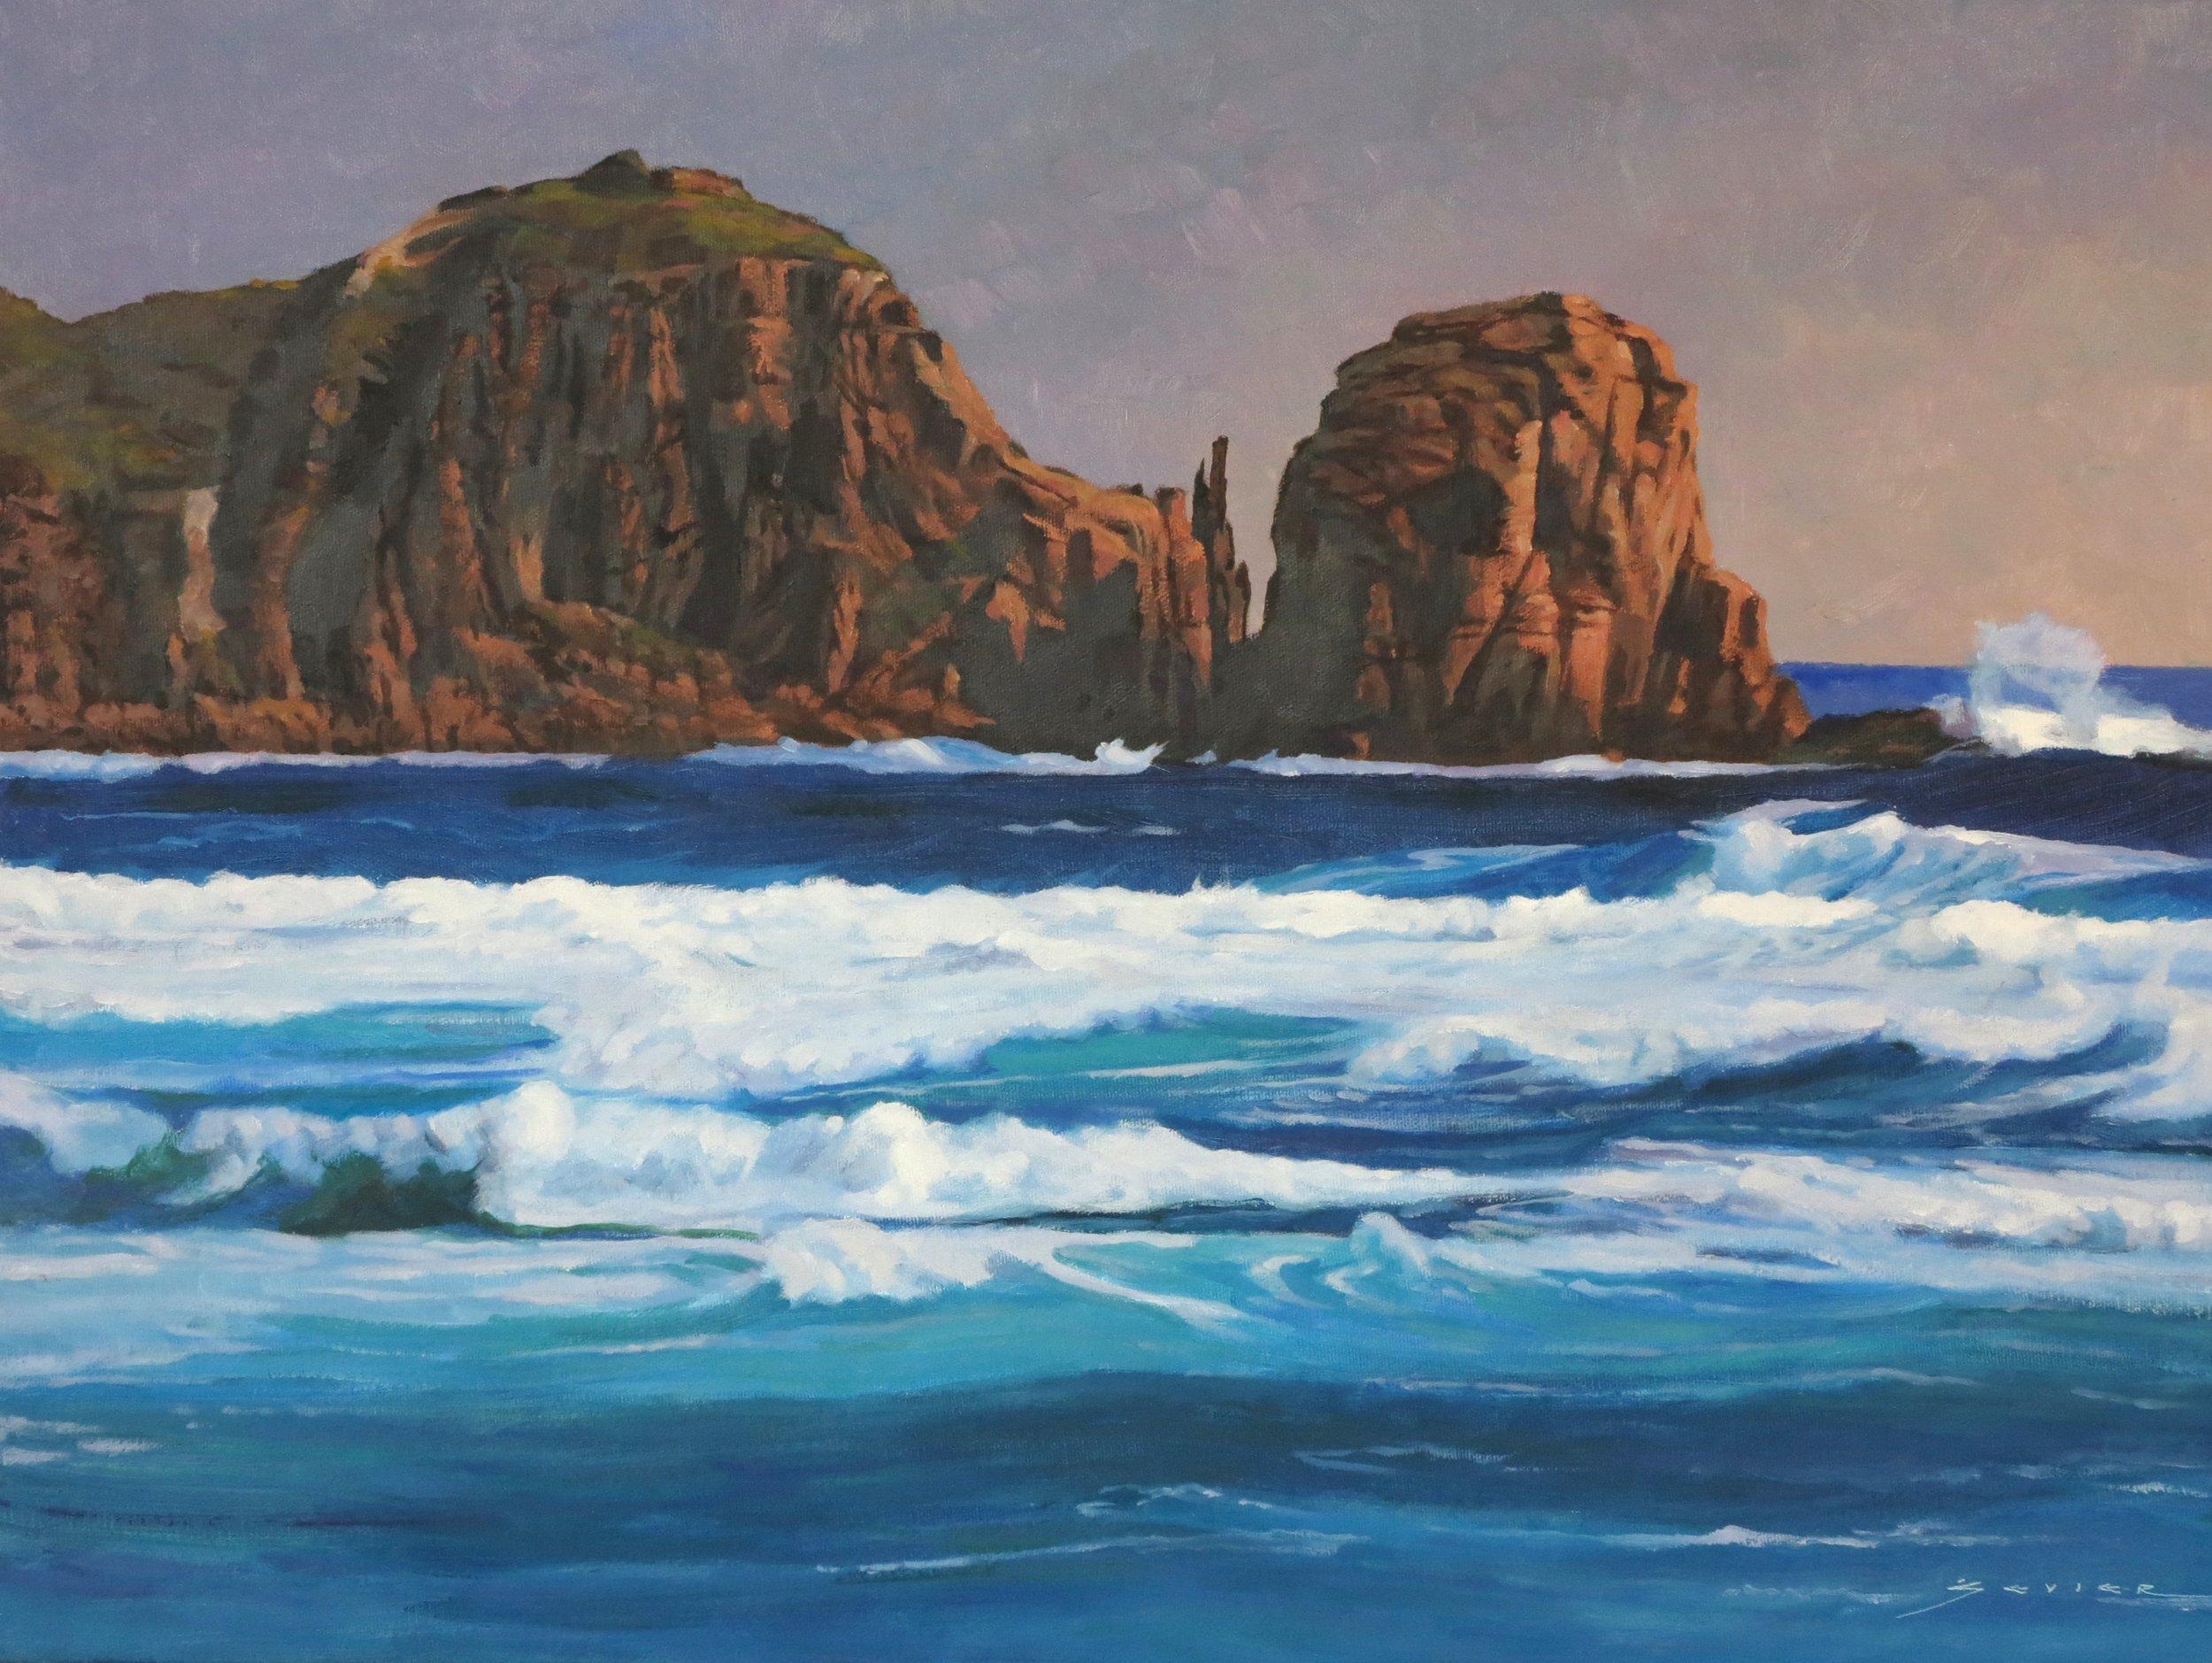 Philip Island/Australia, 18 x 24, oil